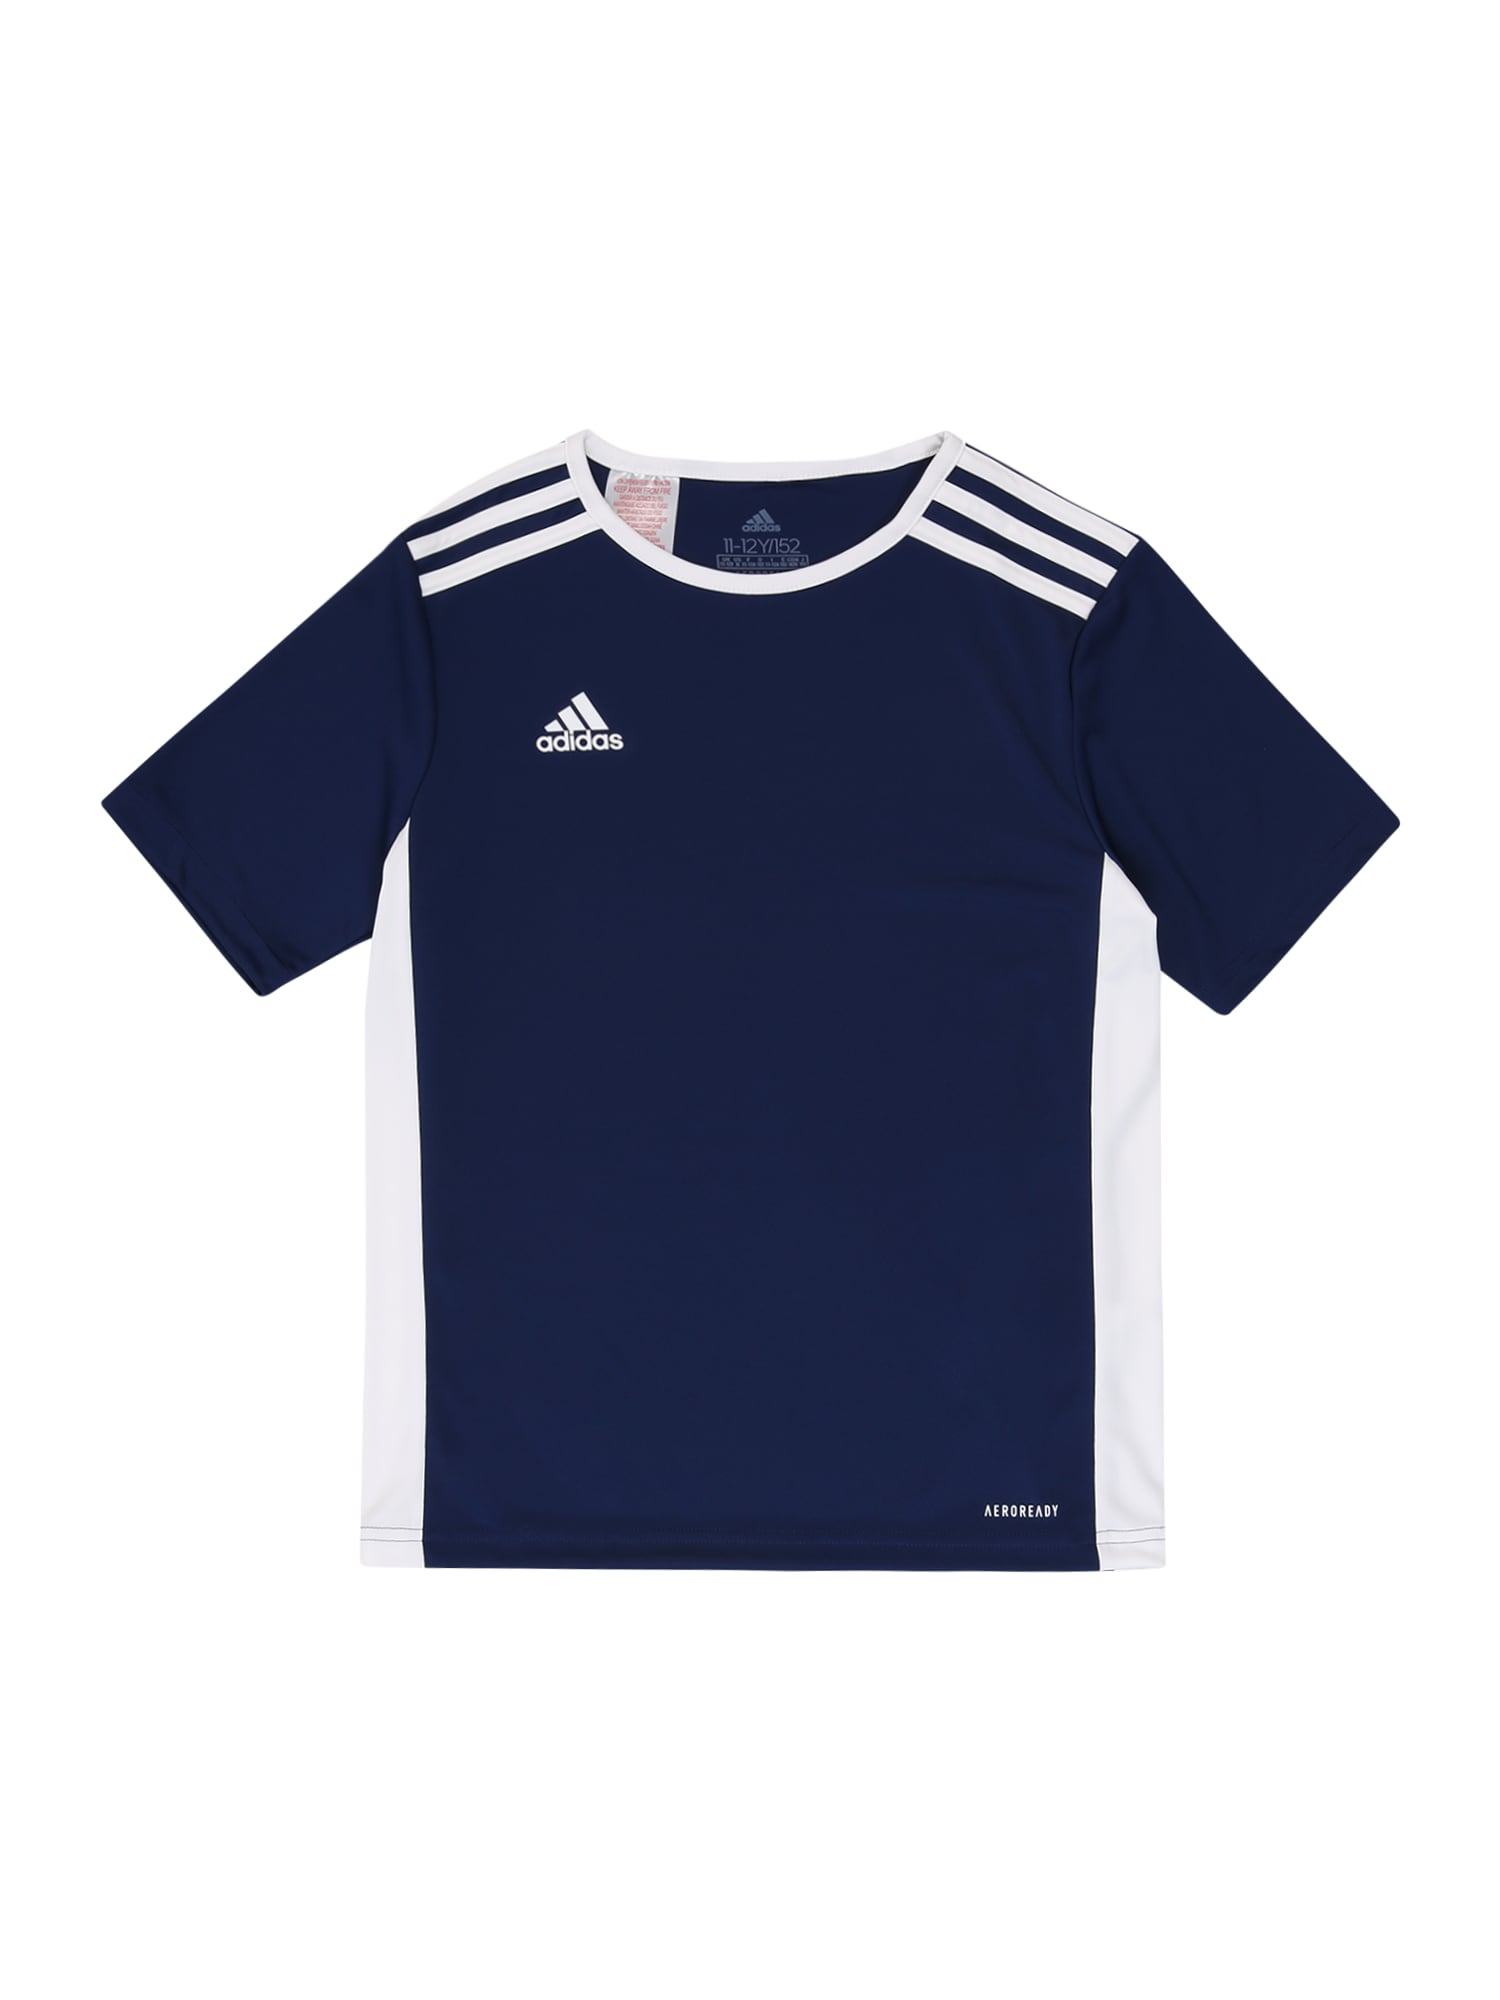 ADIDAS PERFORMANCE Funkční tričko 'Entrada'  tmavě modrá / bílá